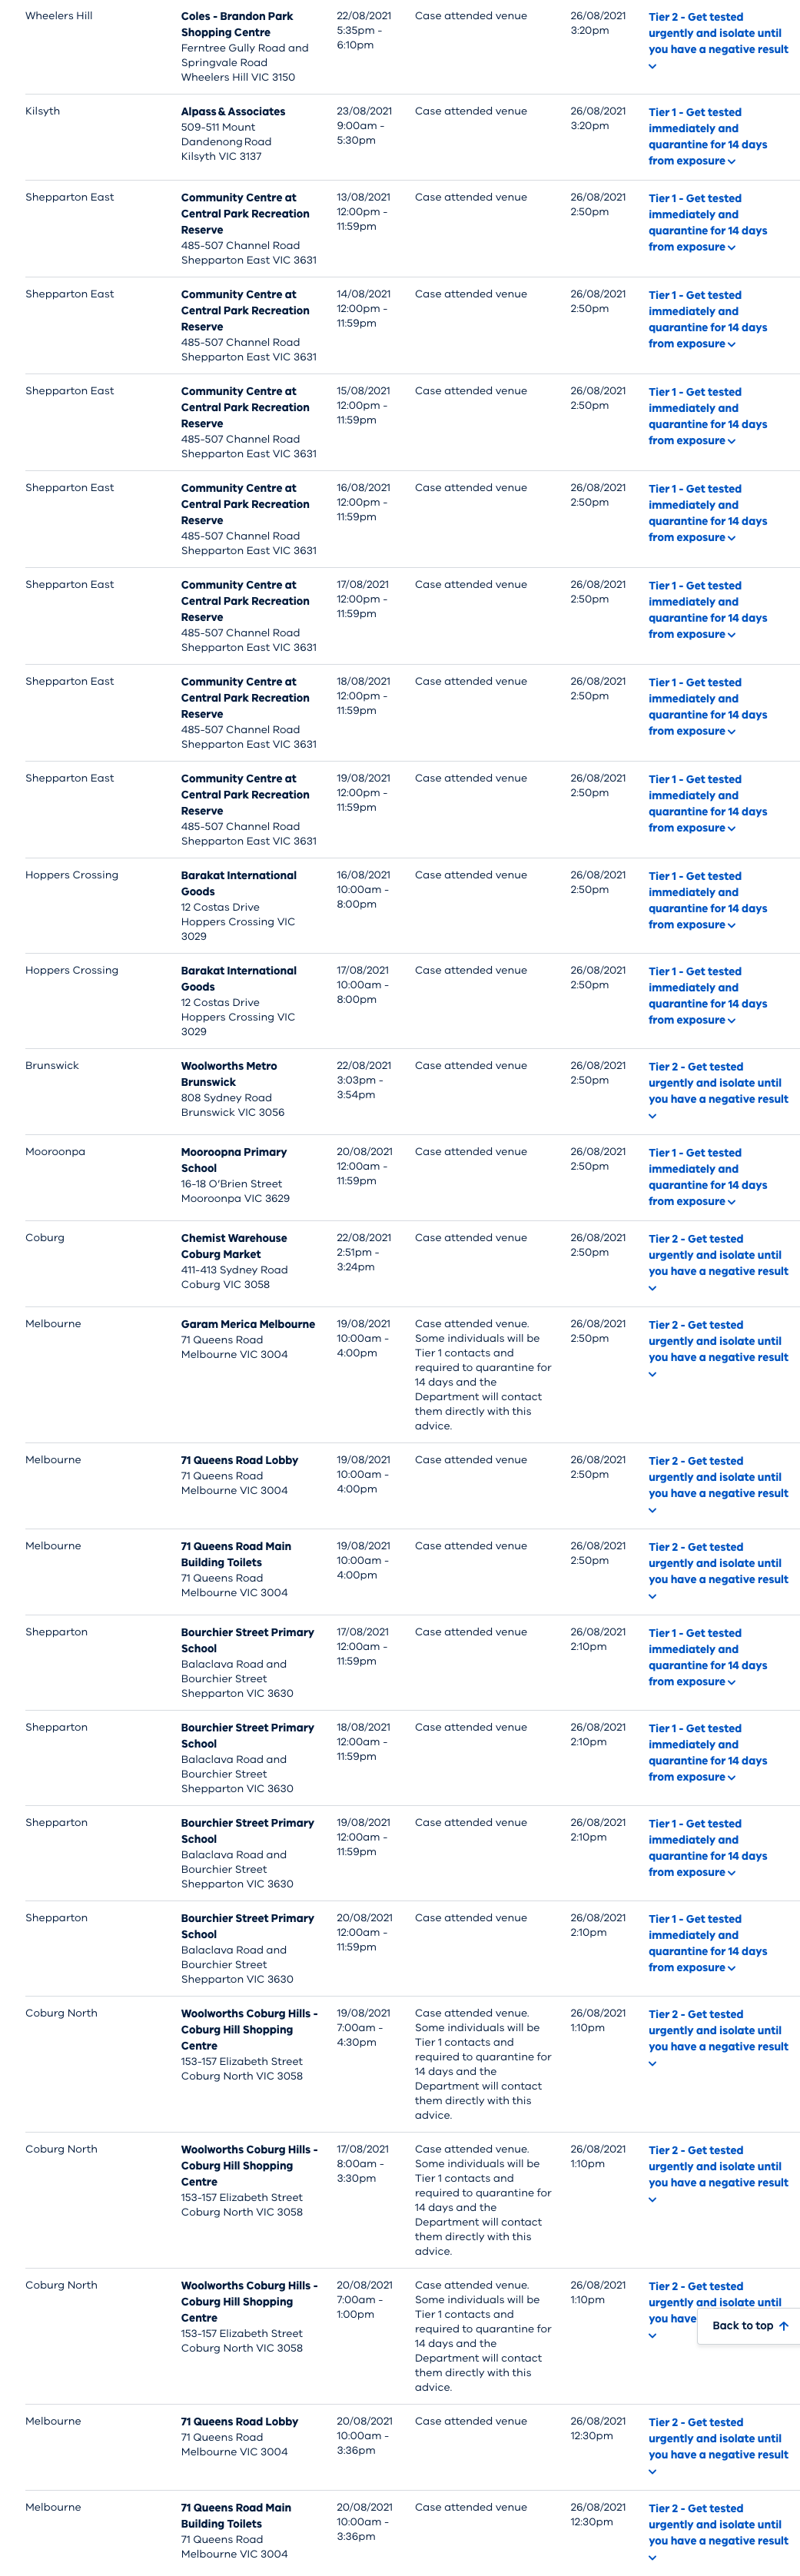 www.coronavirus.vic.gov.au_exposure-sites (12).png